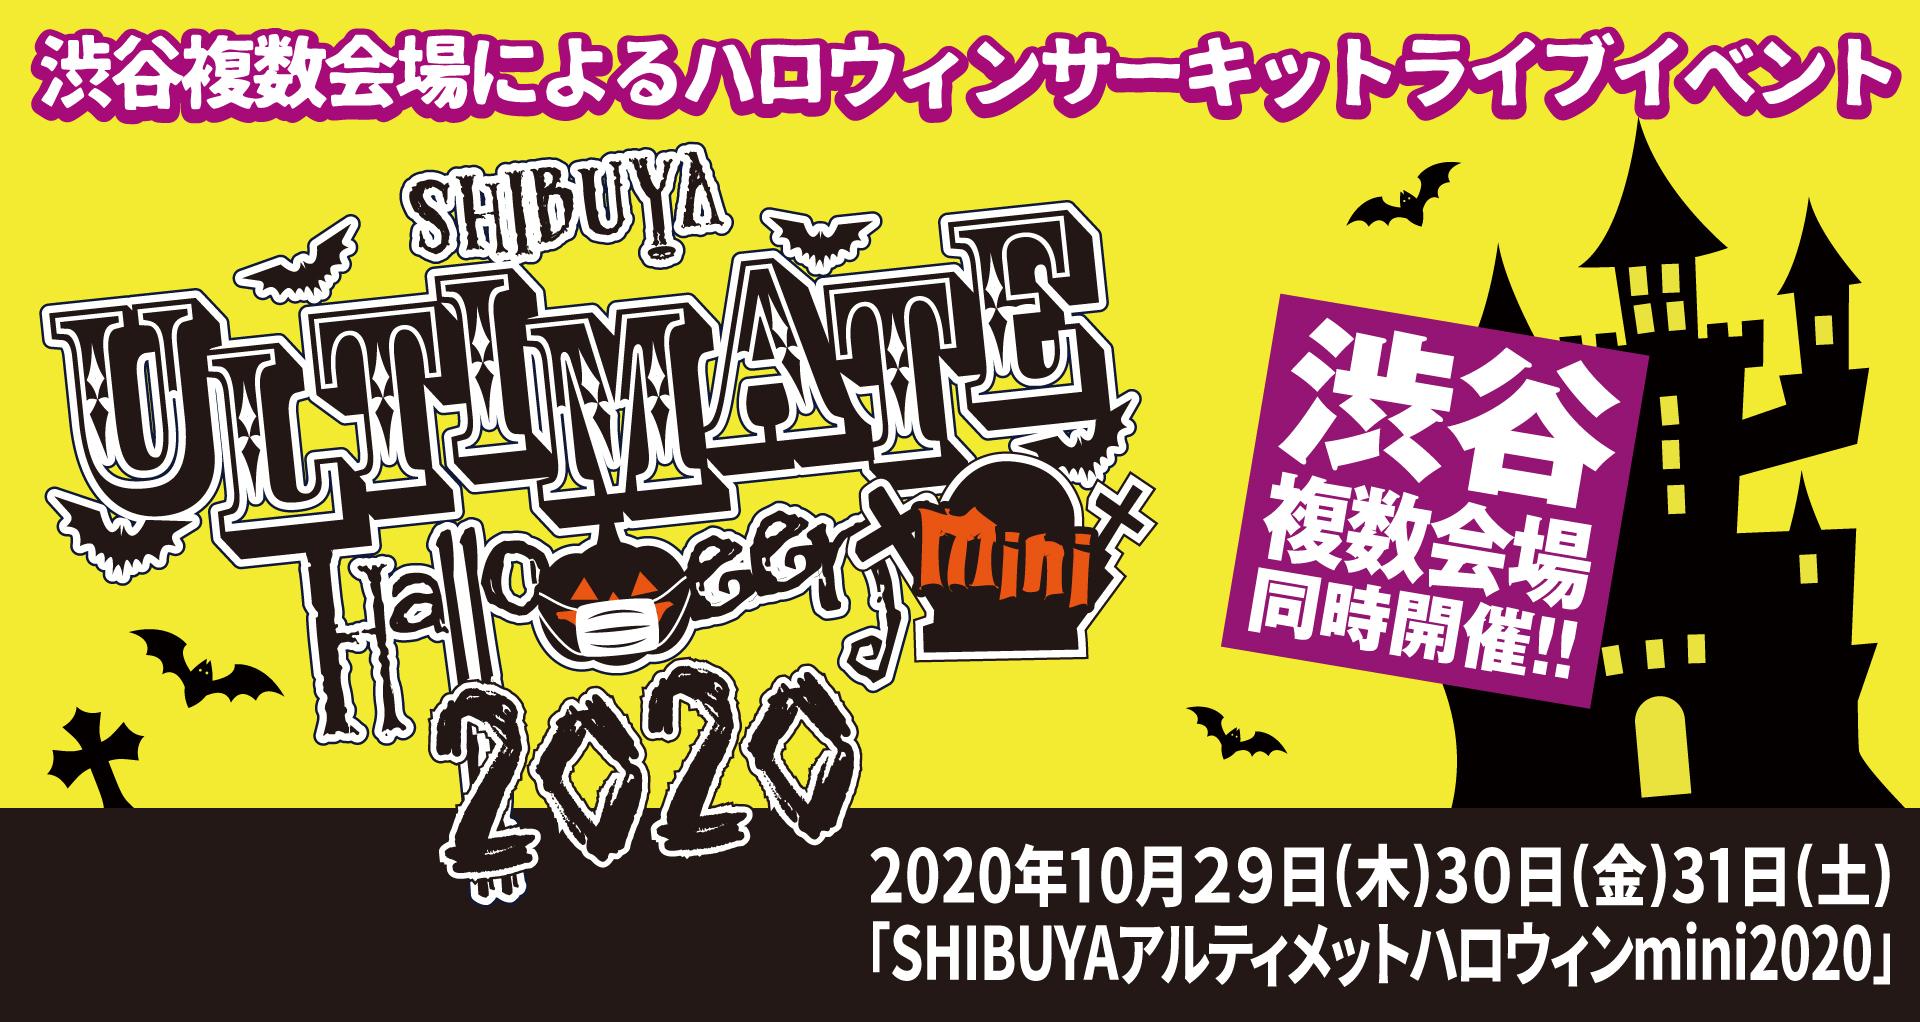 SHIBUYA アルティメットハロウィン mini 2020